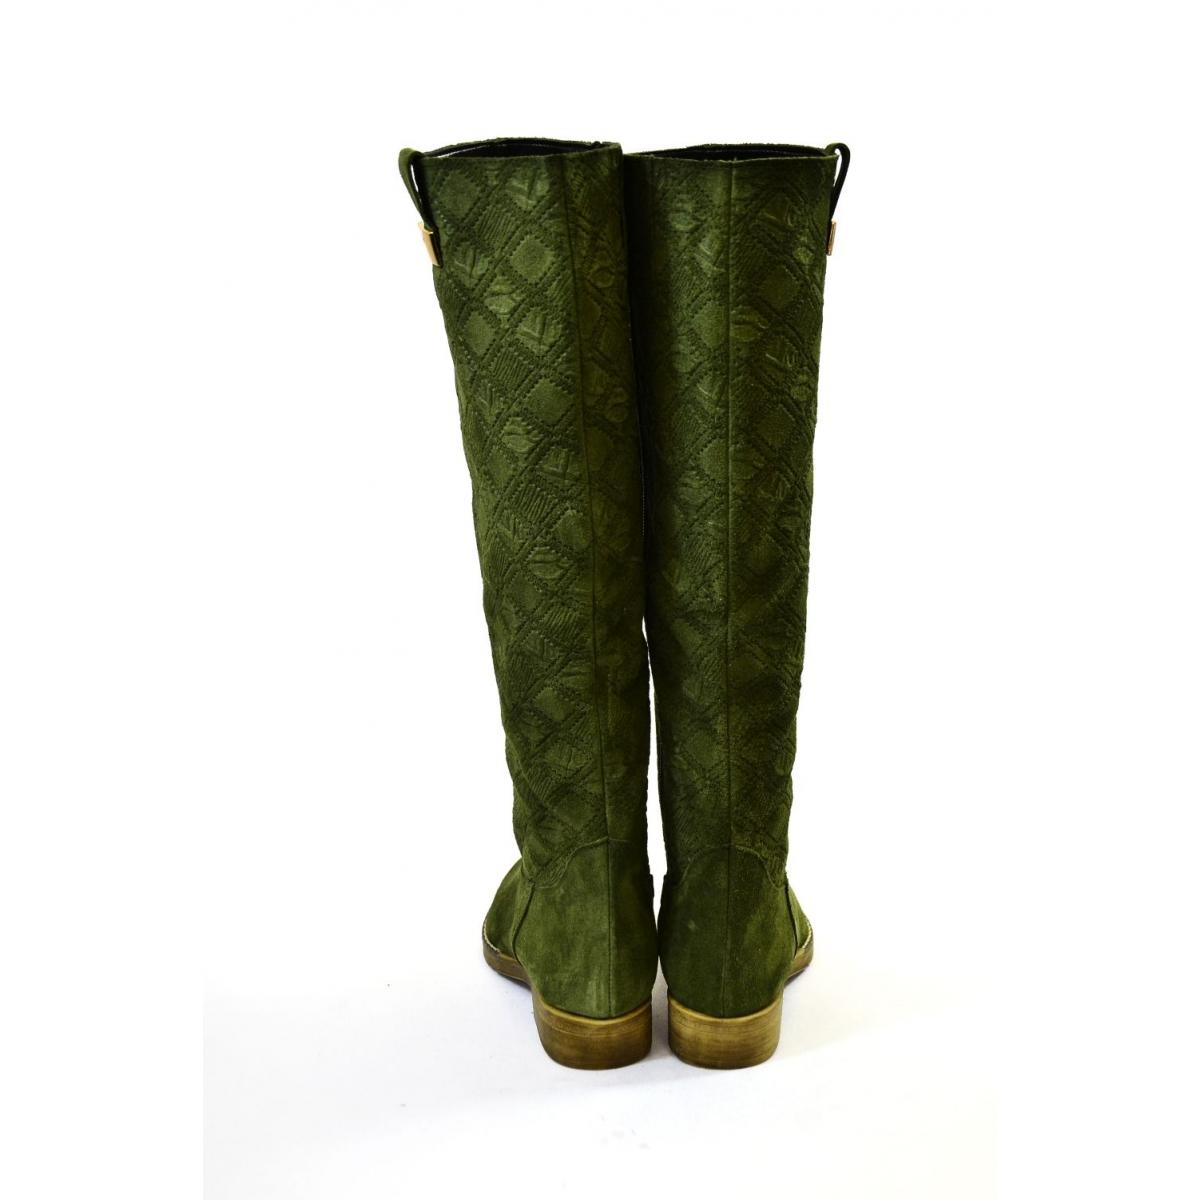 Dámske zelené čižmy CARA - 4 bd9dec7dabf